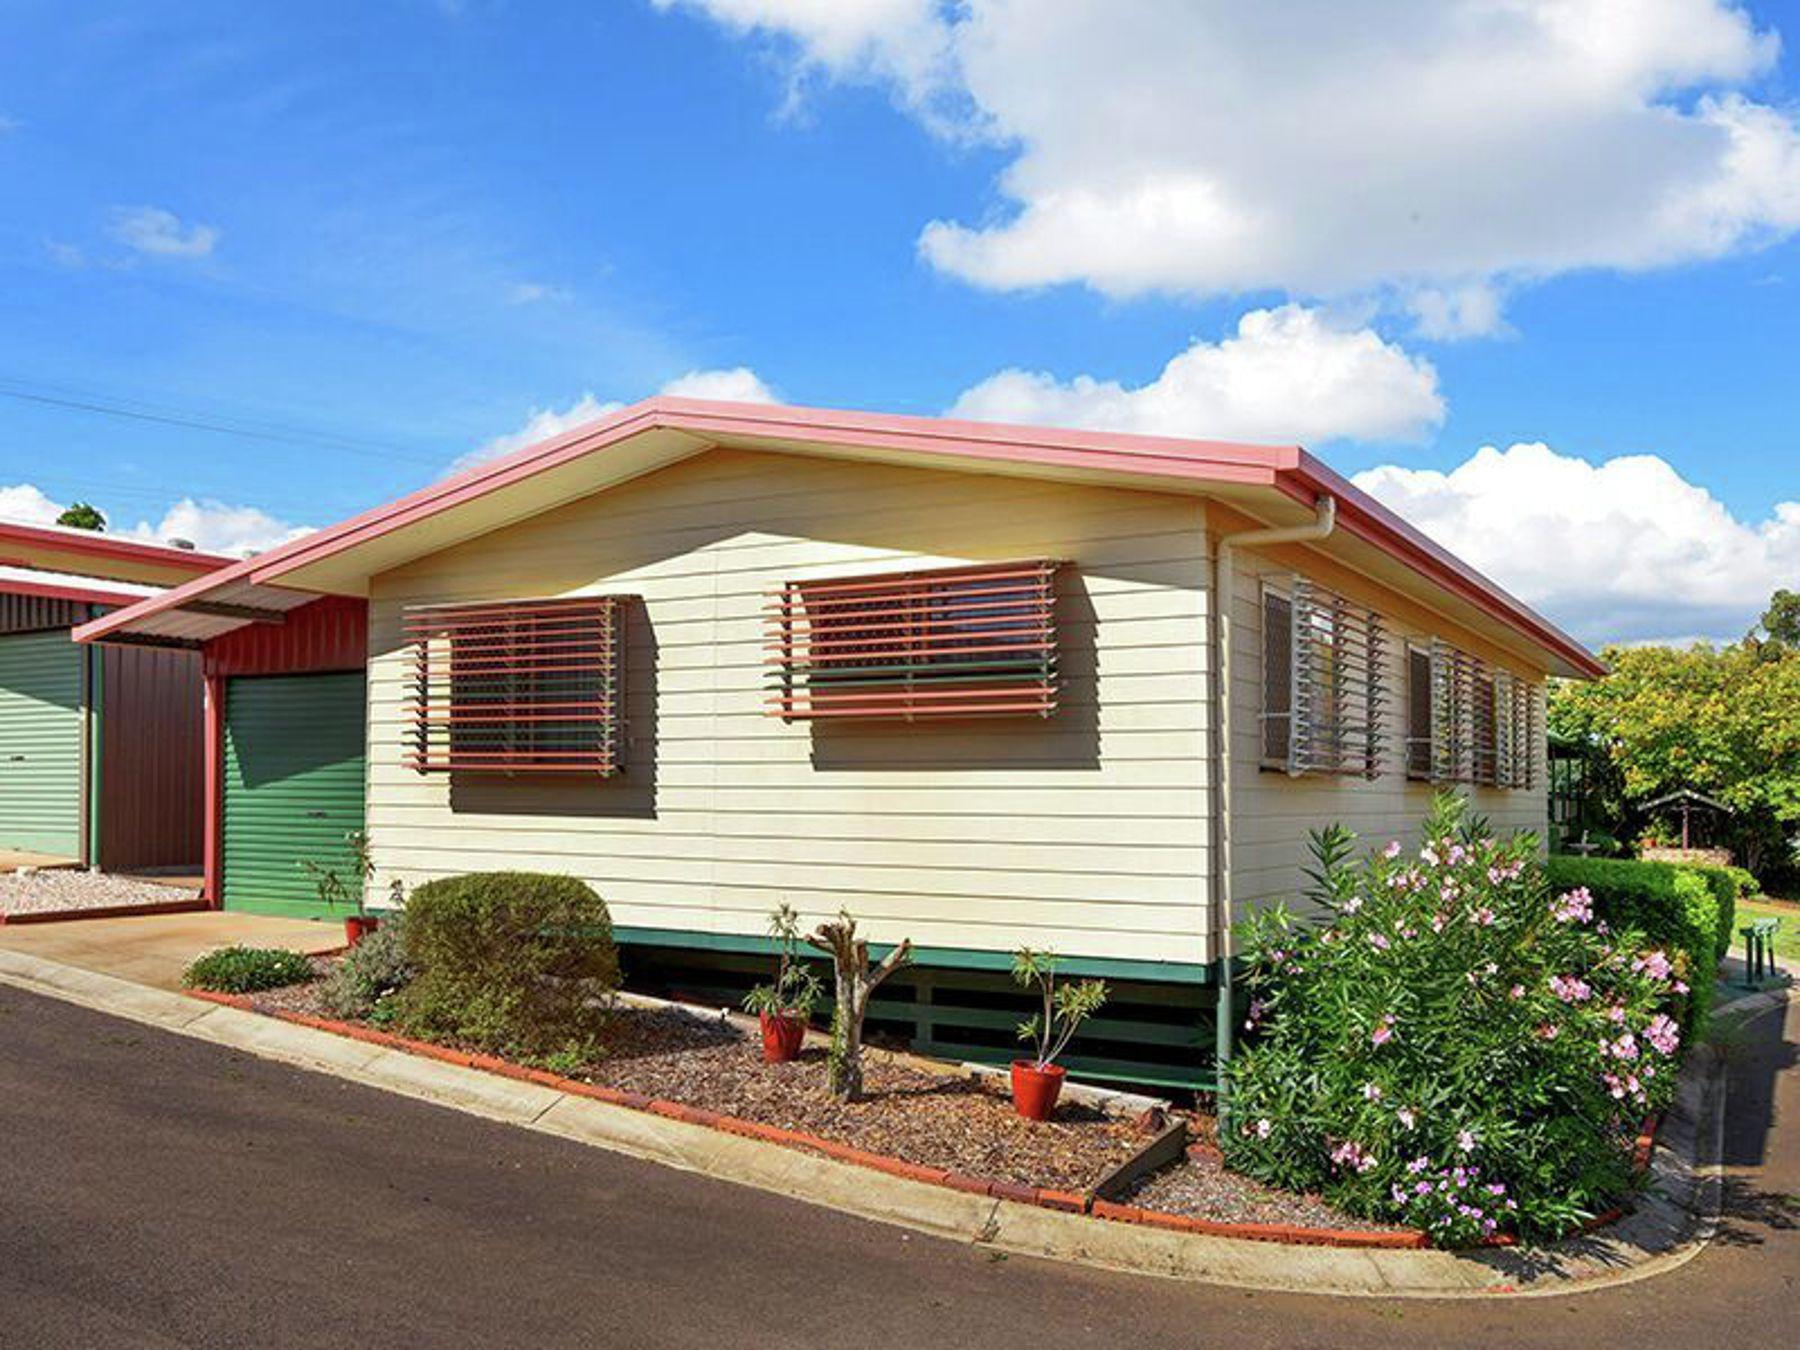 Real Estate in Wilsonton